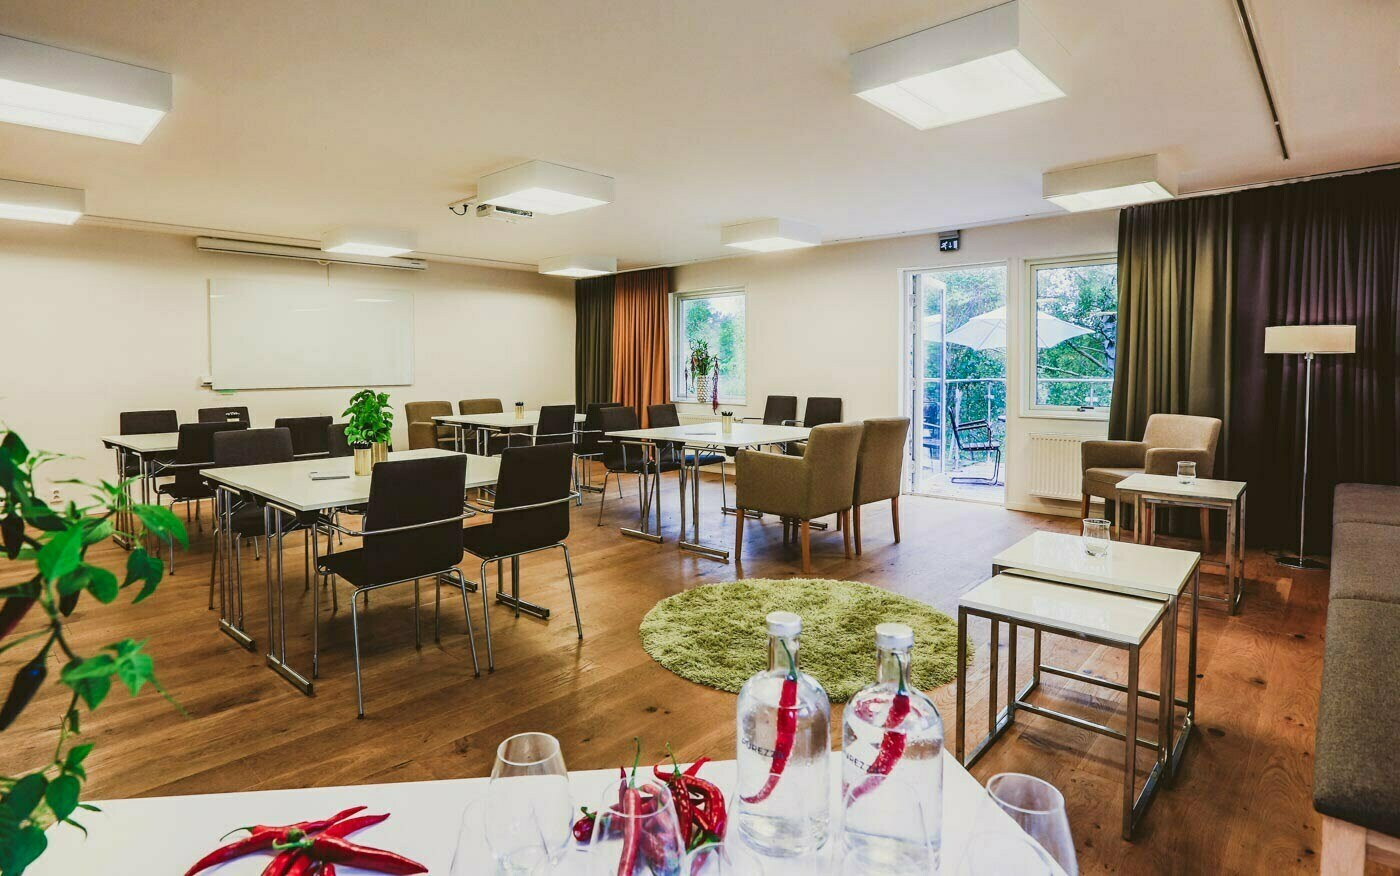 Notholmen - konferens i eget hus upp till 40 personer